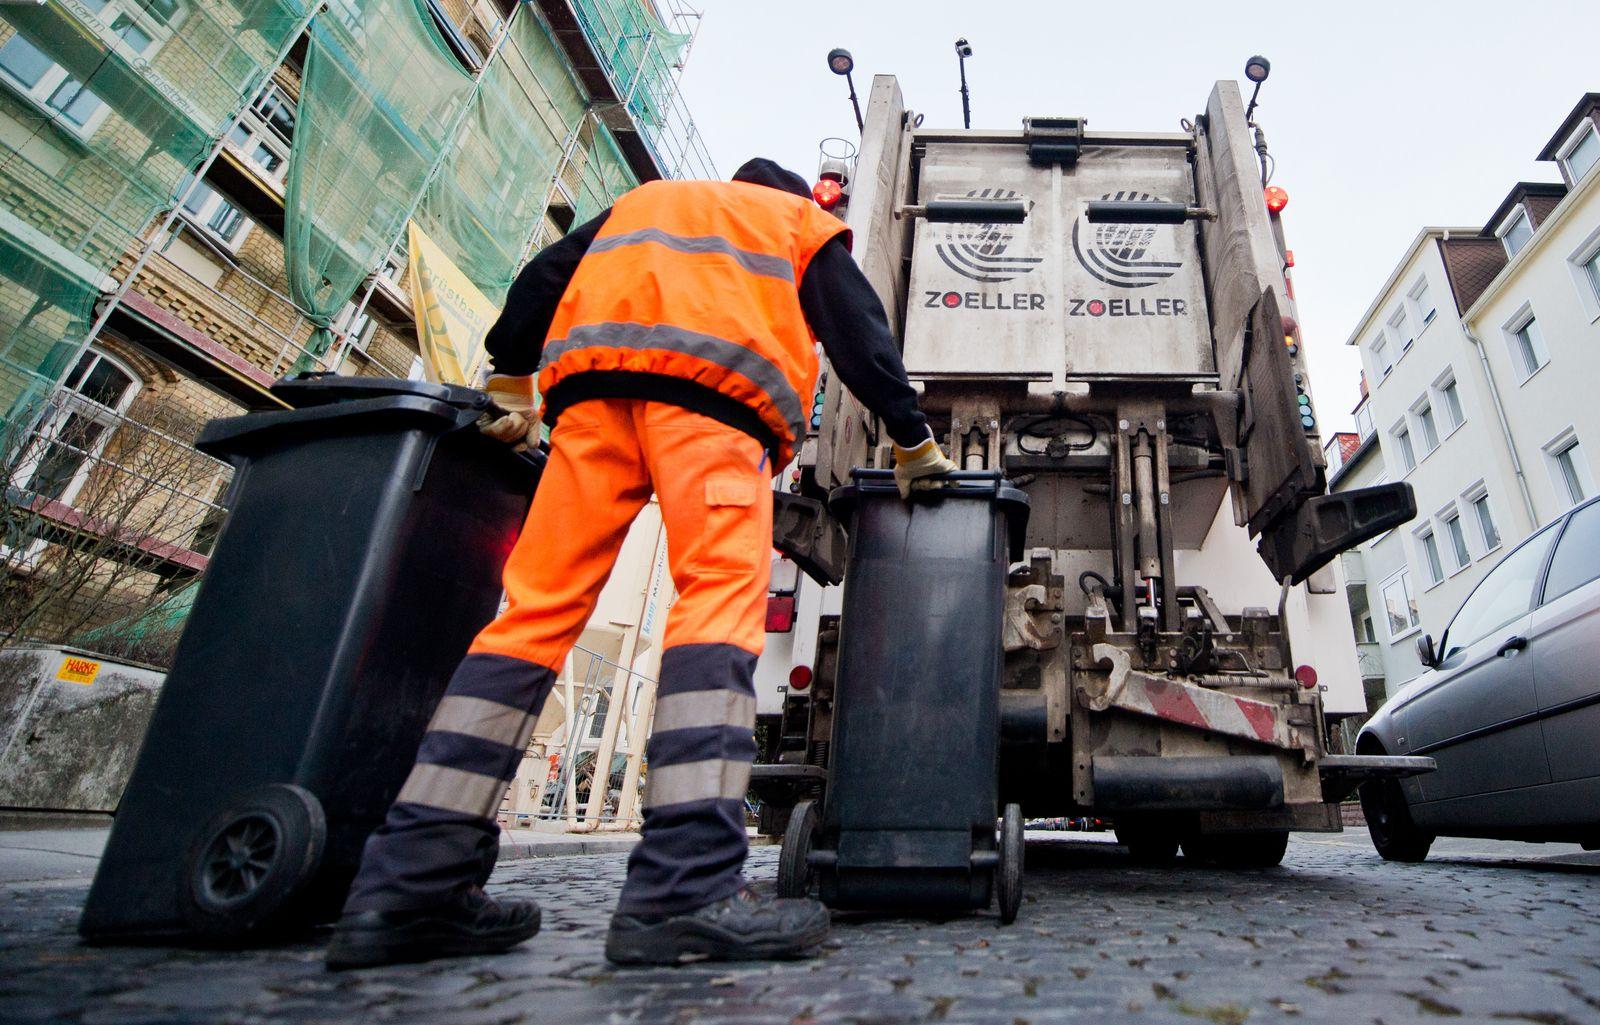 Müllabfuhr / Müllmänner / Müll / Mülltonnen